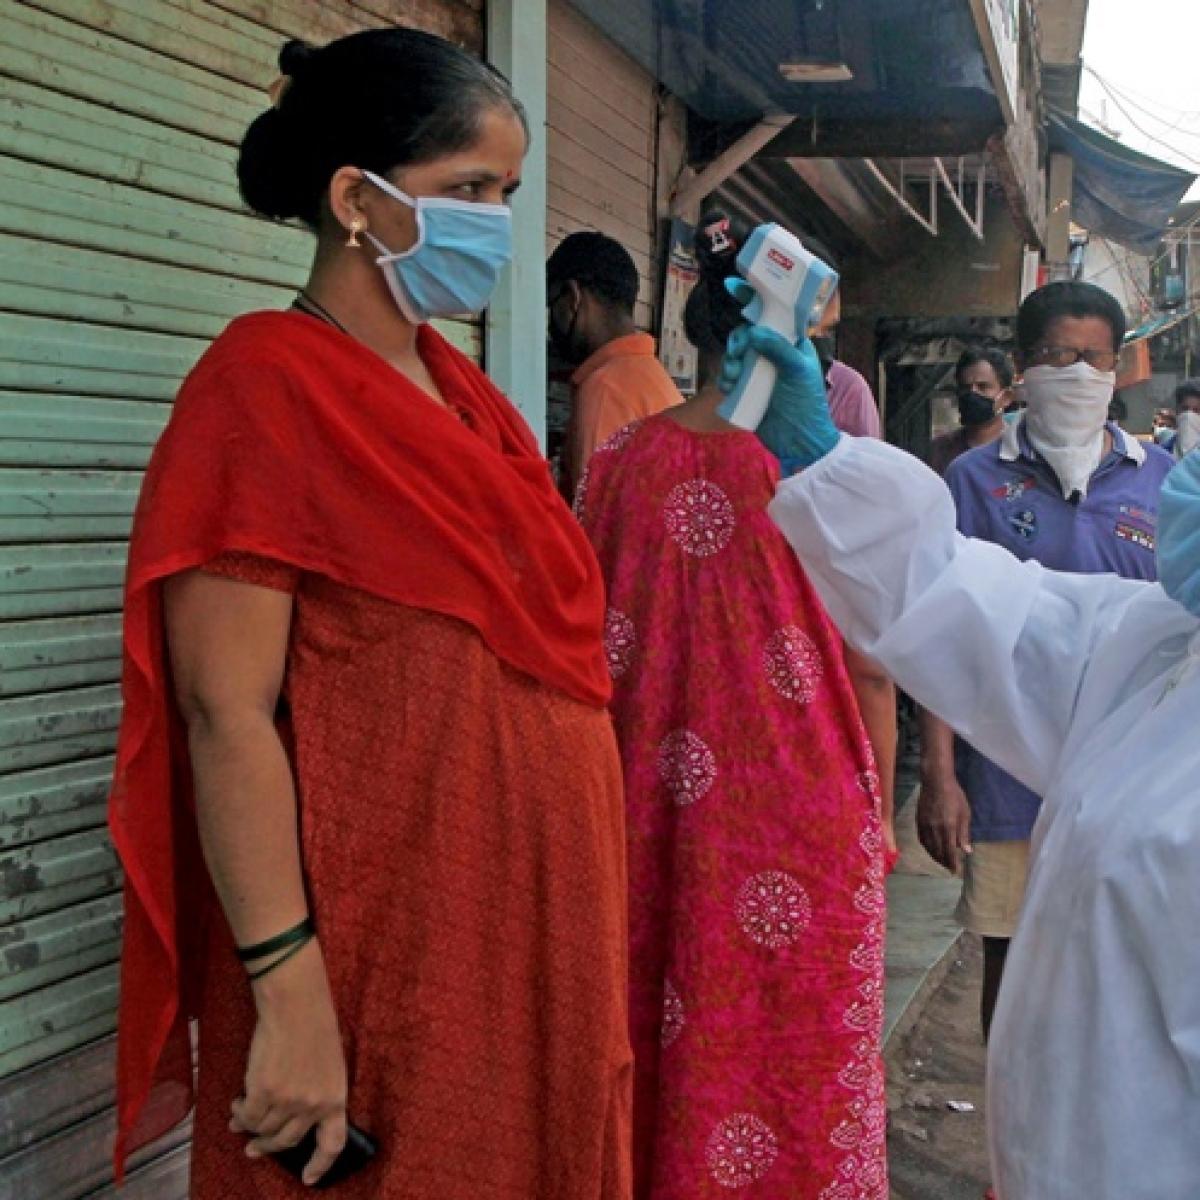 Big Brotherly BMC? Mumbai woman with no symptoms and no travel history dragged to quarantine